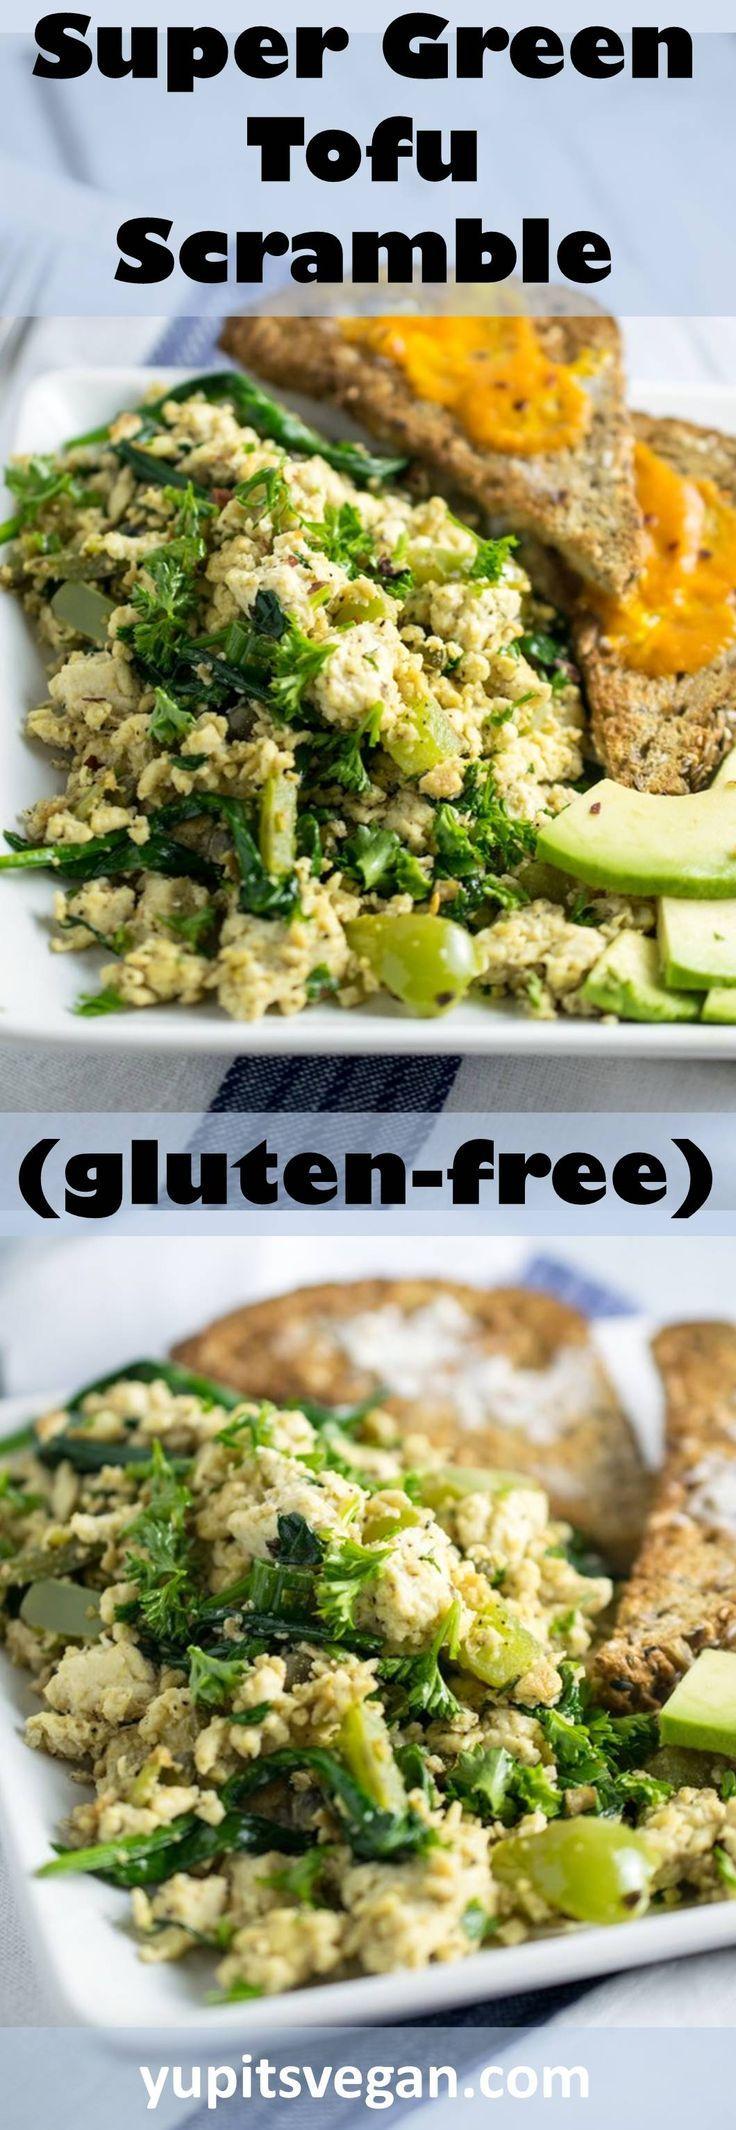 Super Green Tofu Scramble | Yup, it's Vegan. Healthy tofu scramble packed with greens and an herbed tahini sauce.